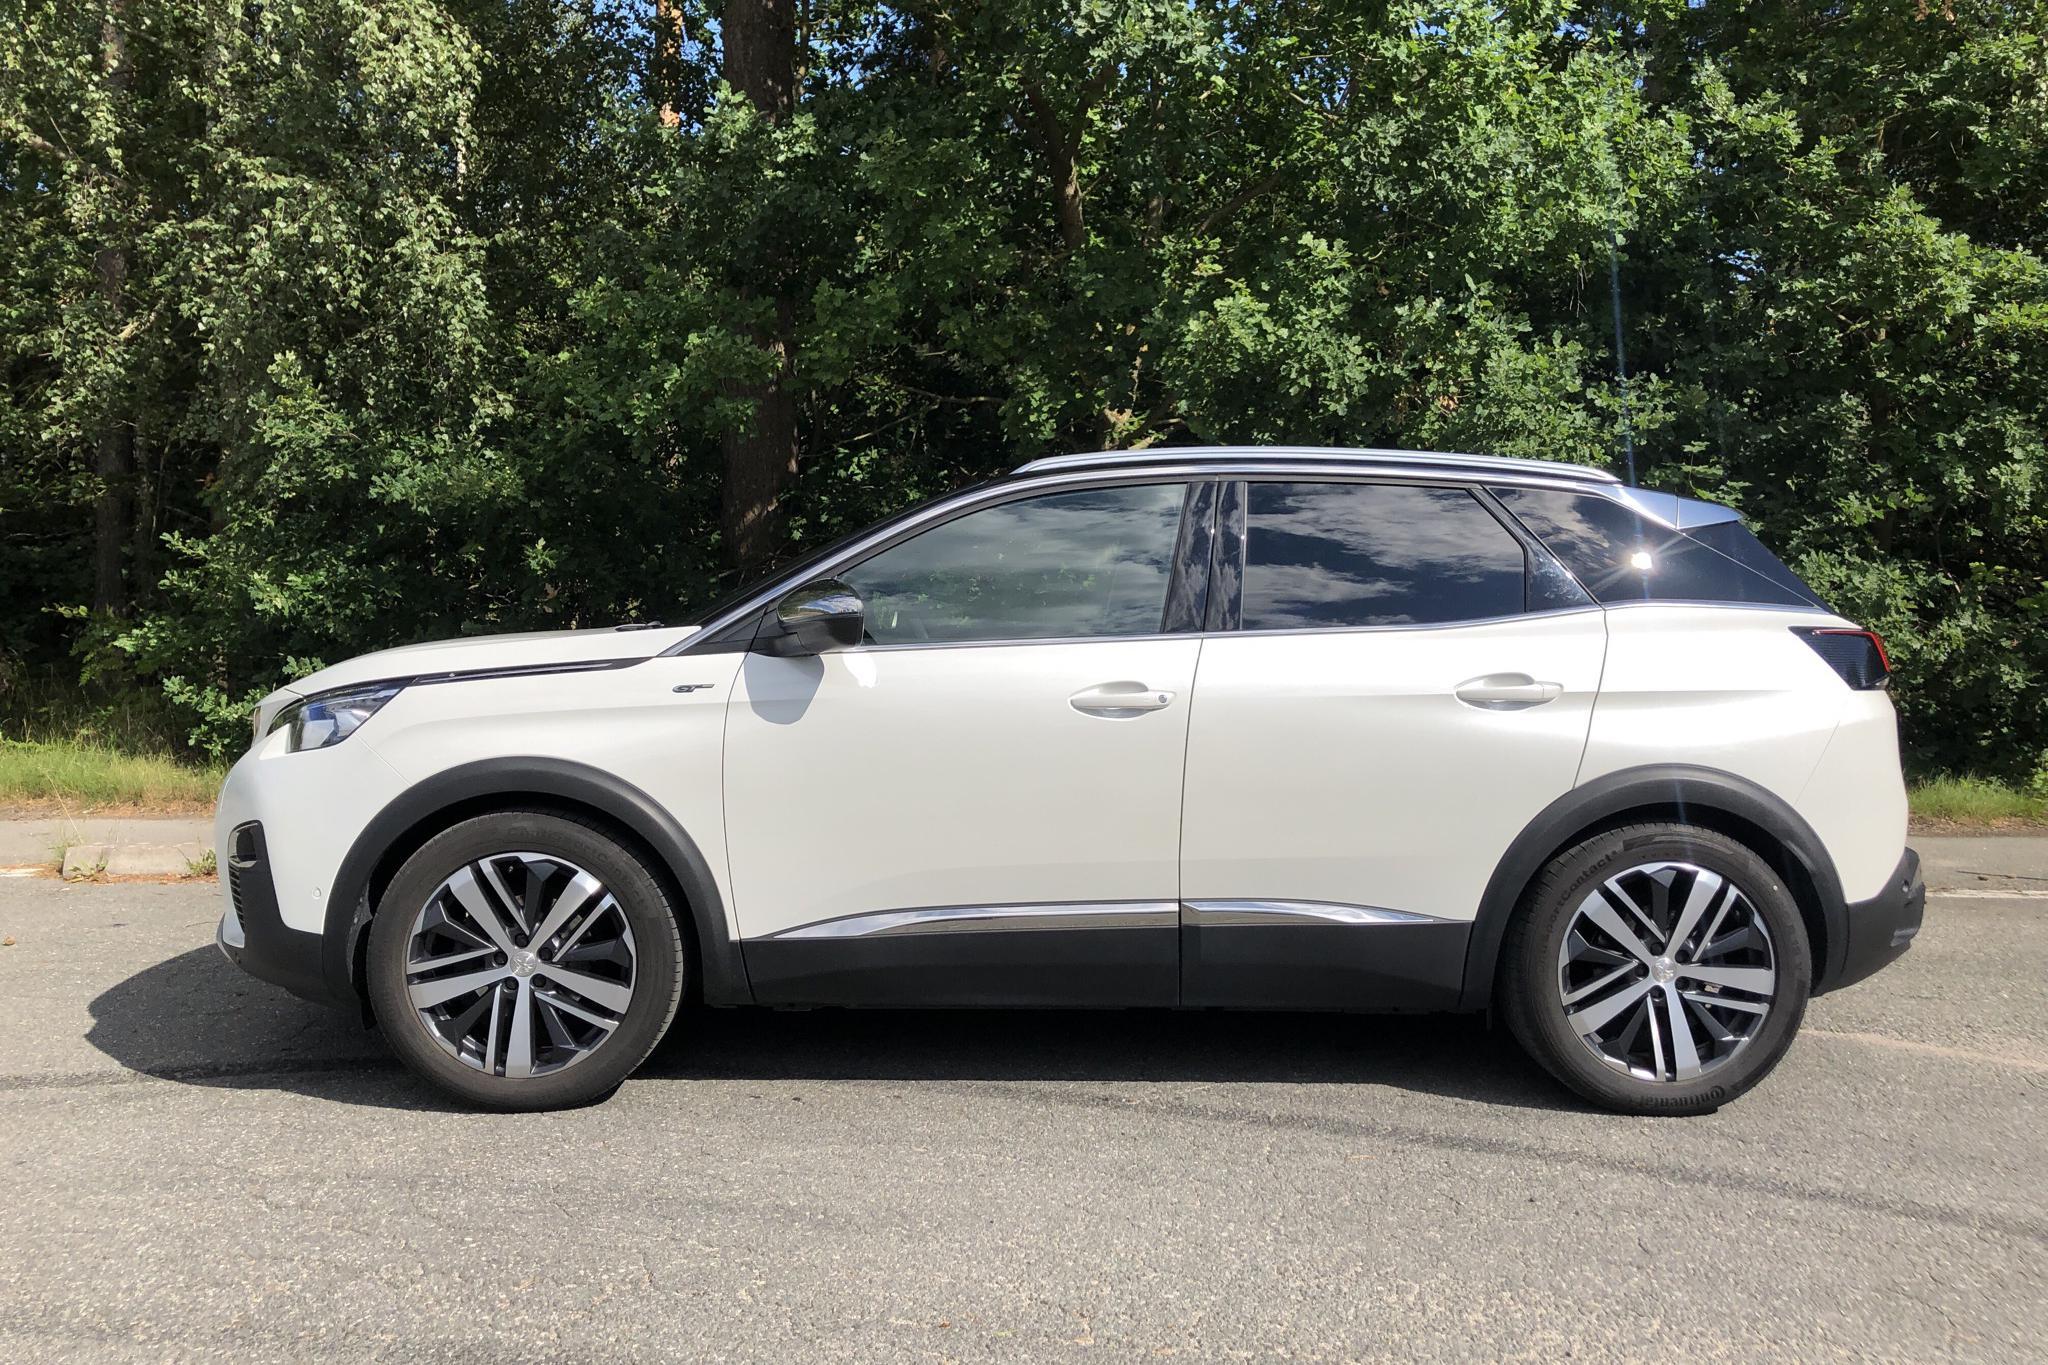 Peugeot 3008 2.0 BlueHDi (180hk) - 65 240 km - Automatic - white - 2017